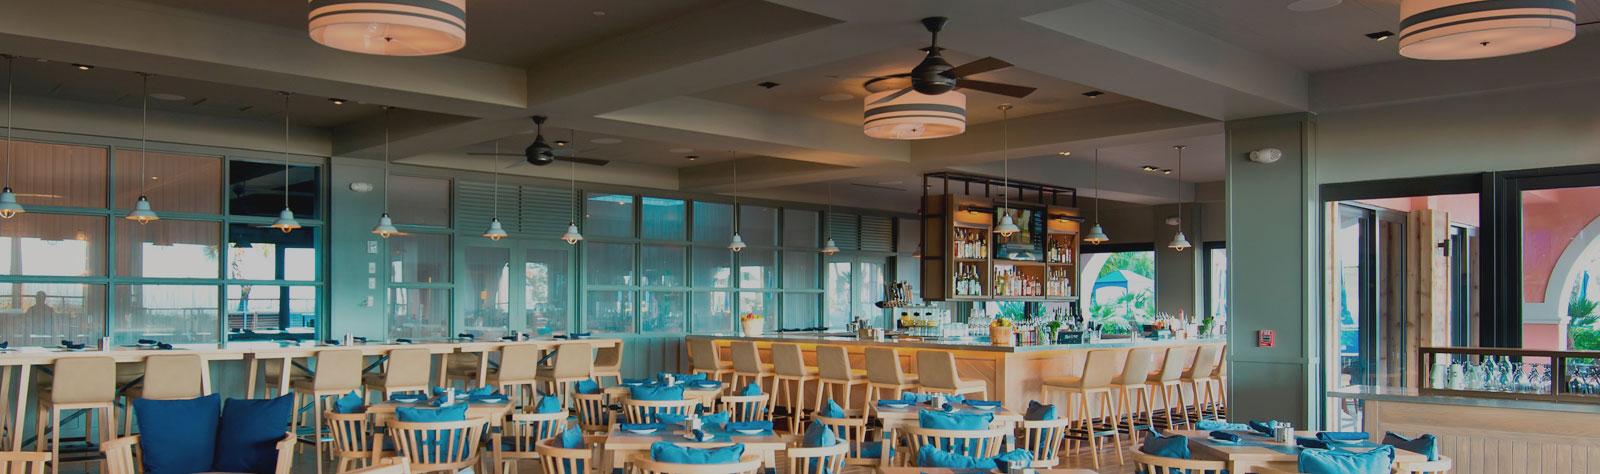 Dining Facilities in Florida Hotel